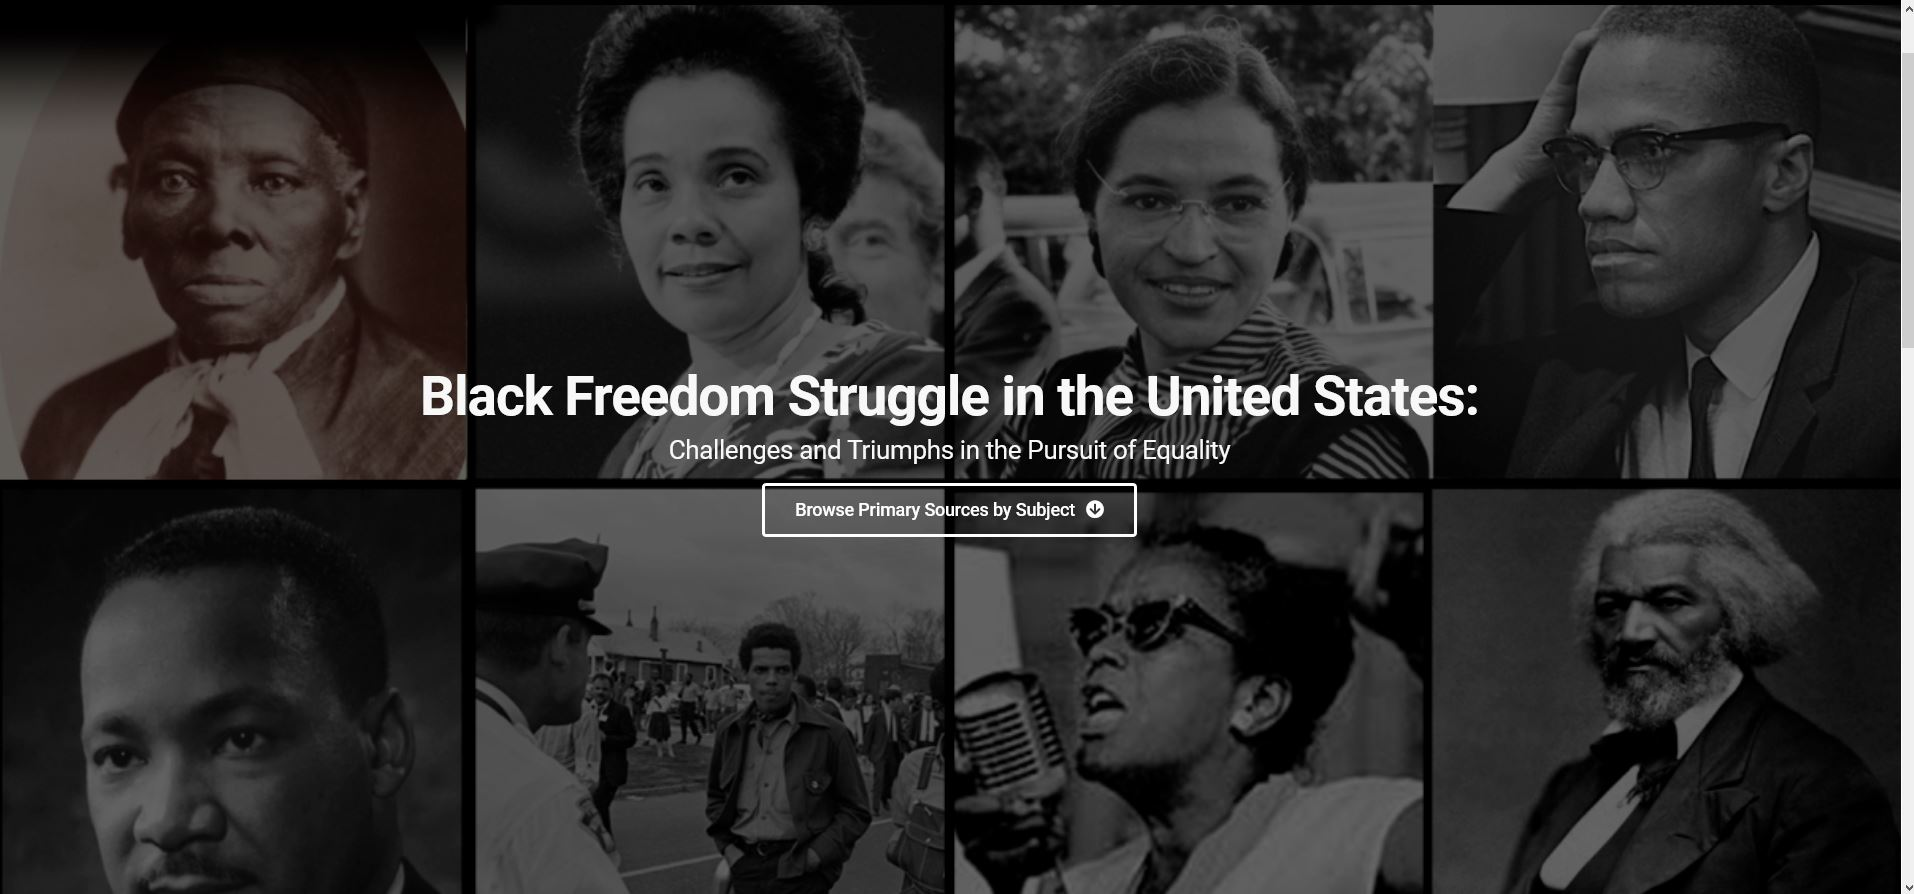 Black Freedom Struggle